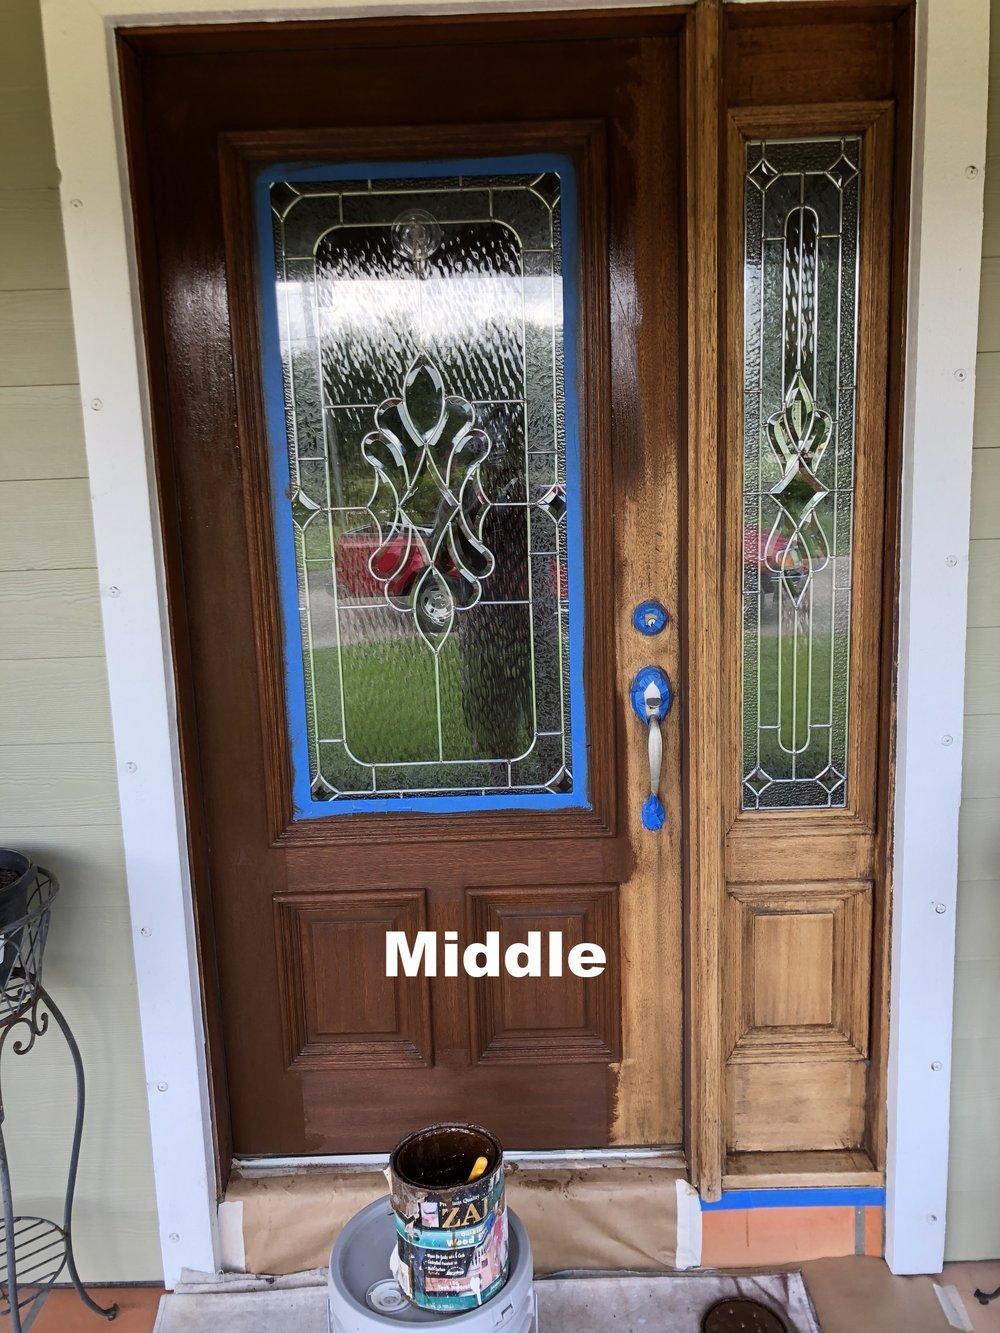 Middle.JPG